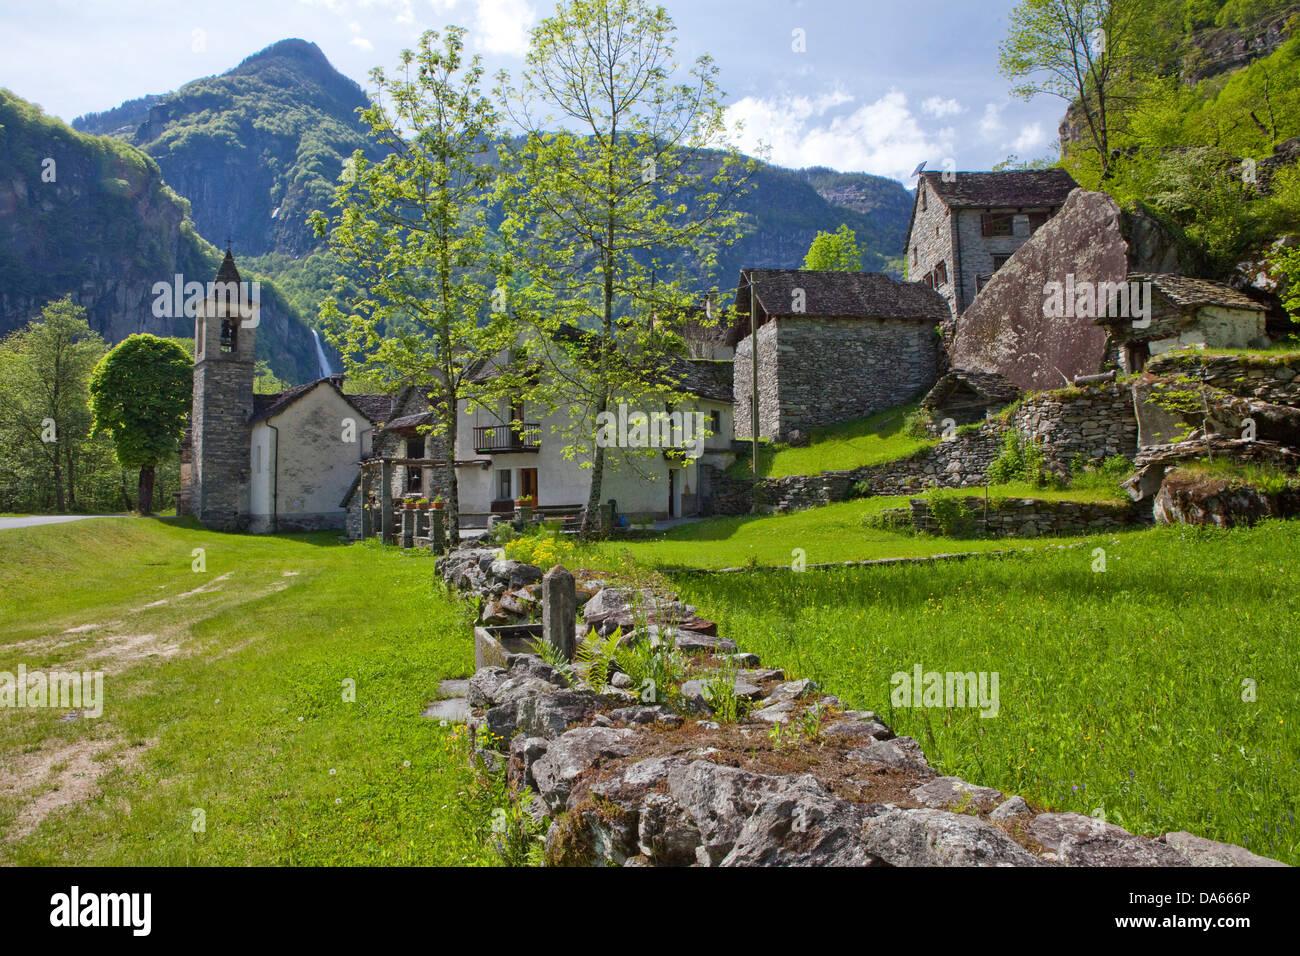 Village, Bavona valley, canton, TI, Ticino, South Switzerland, village, Switzerland, Europe, Ritorto, stone houses - Stock Image